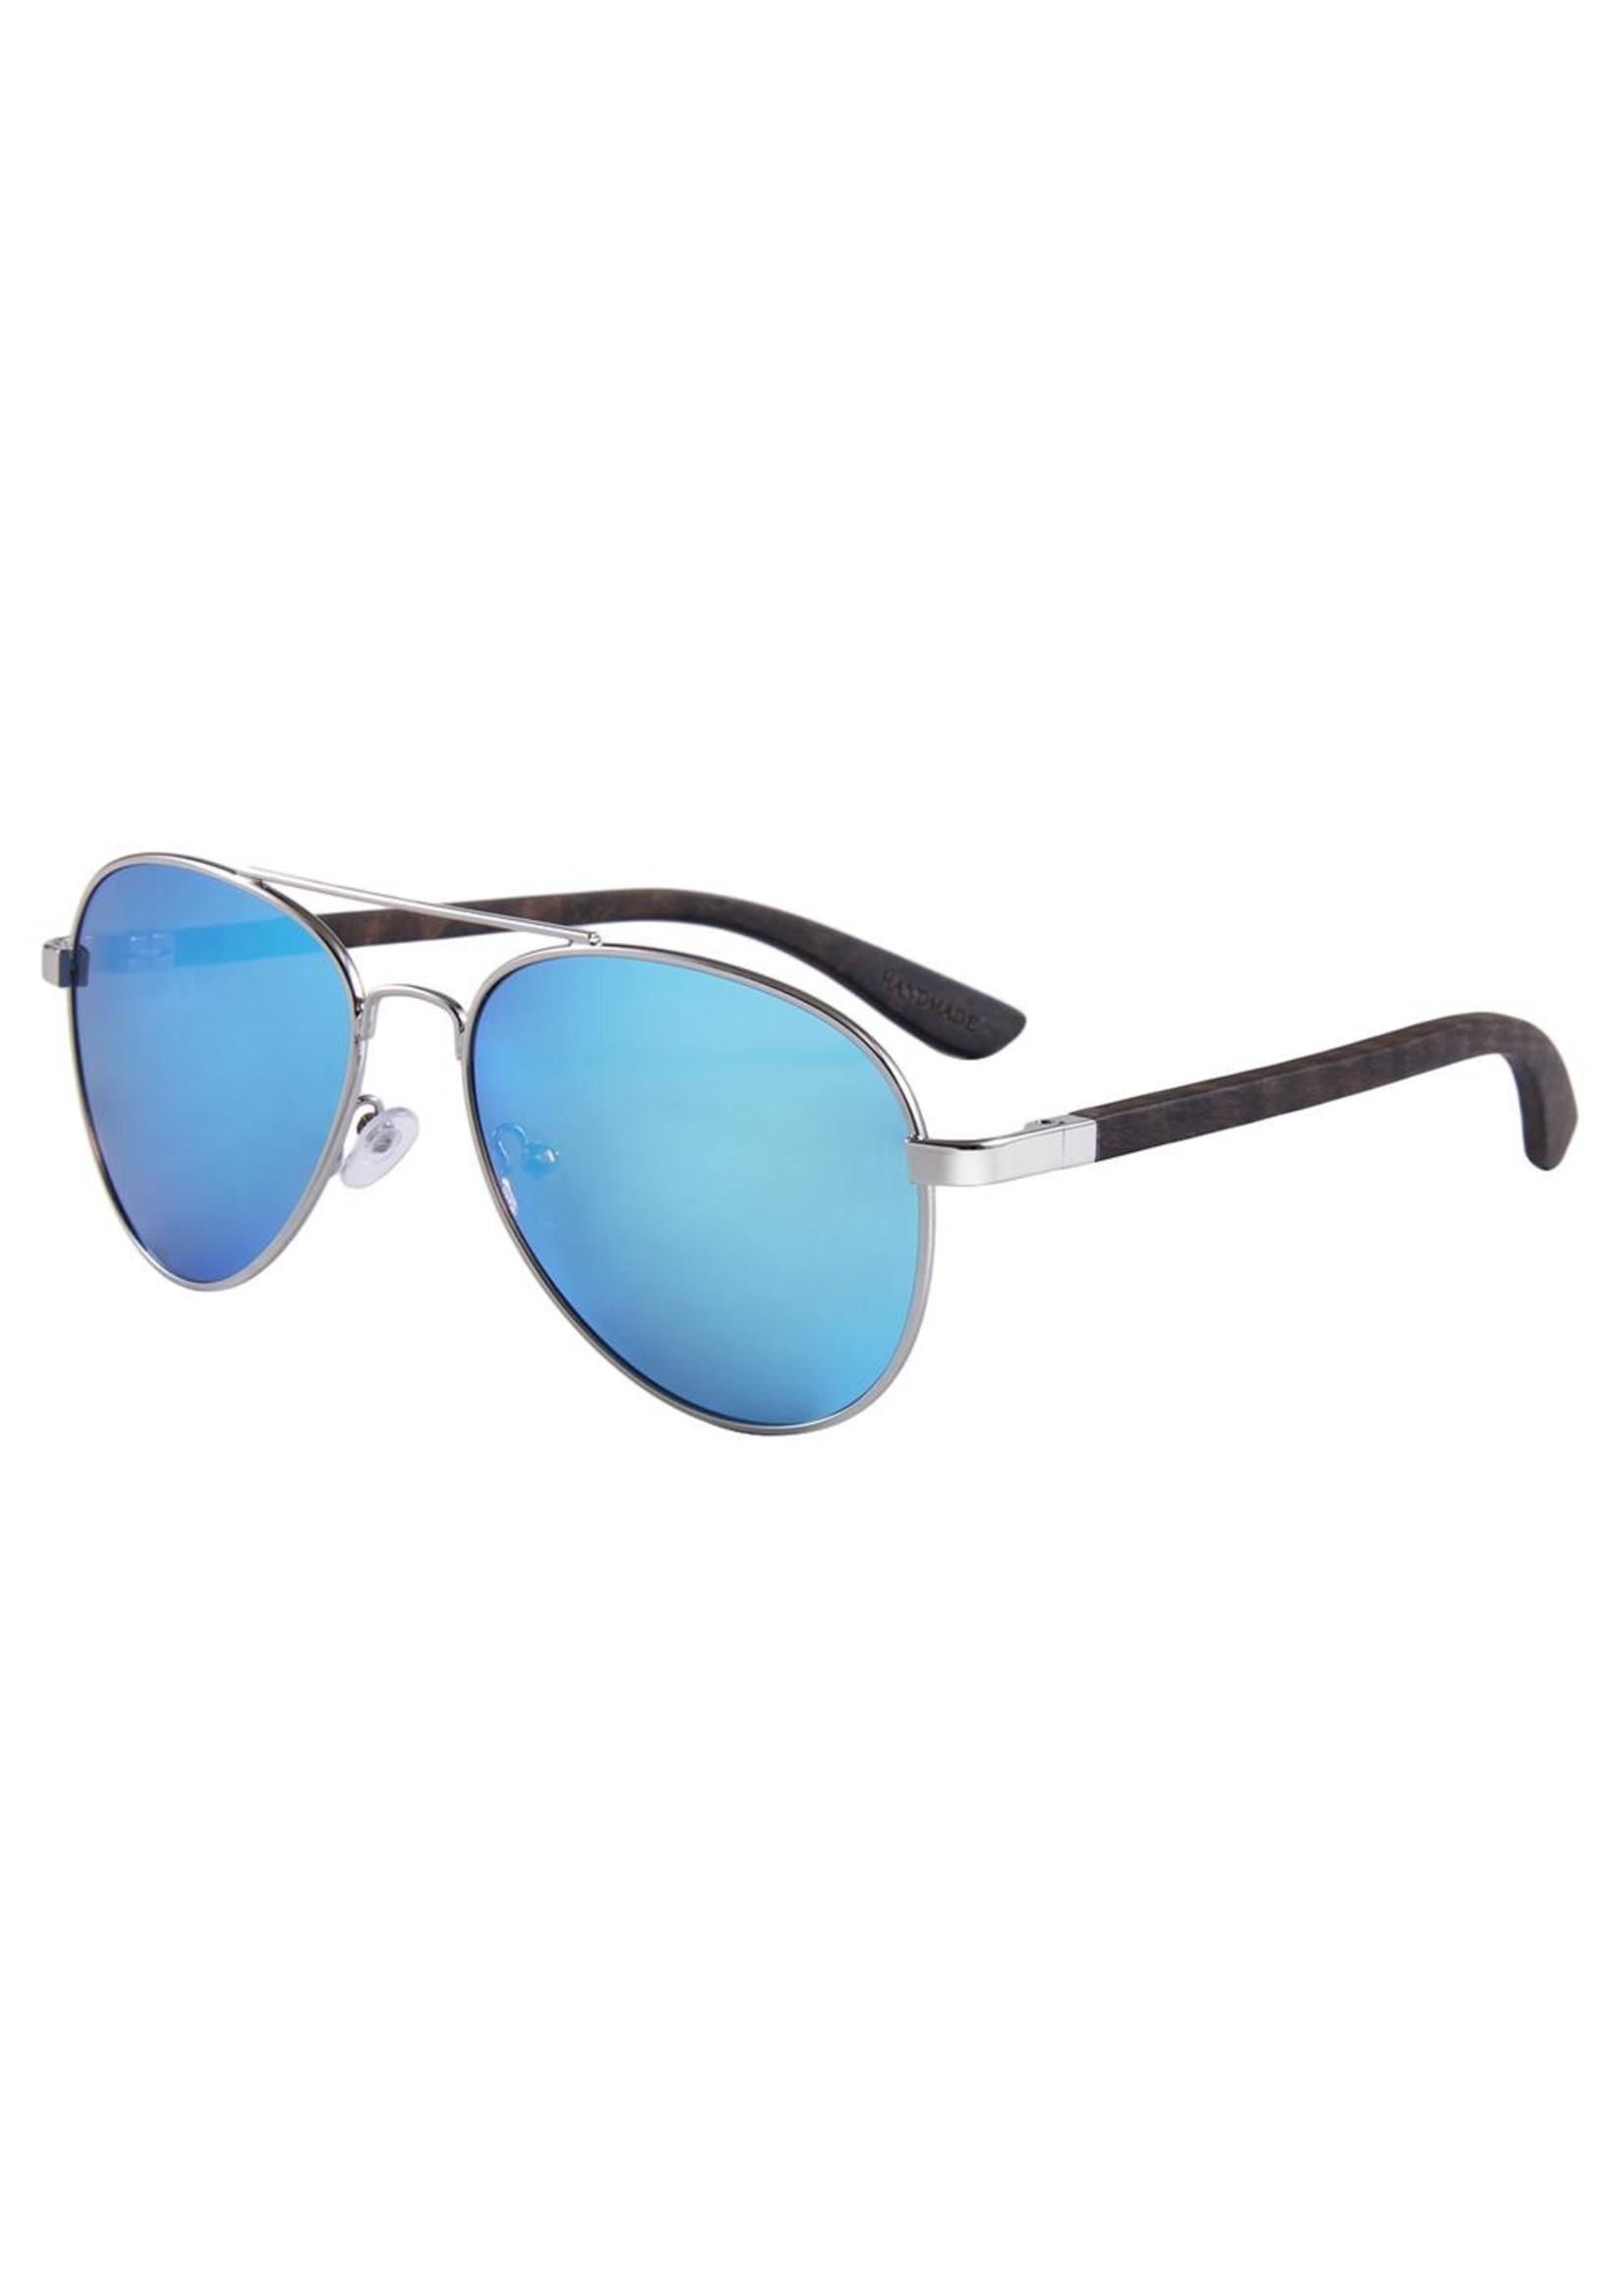 Hawaii - Mirrored Blue